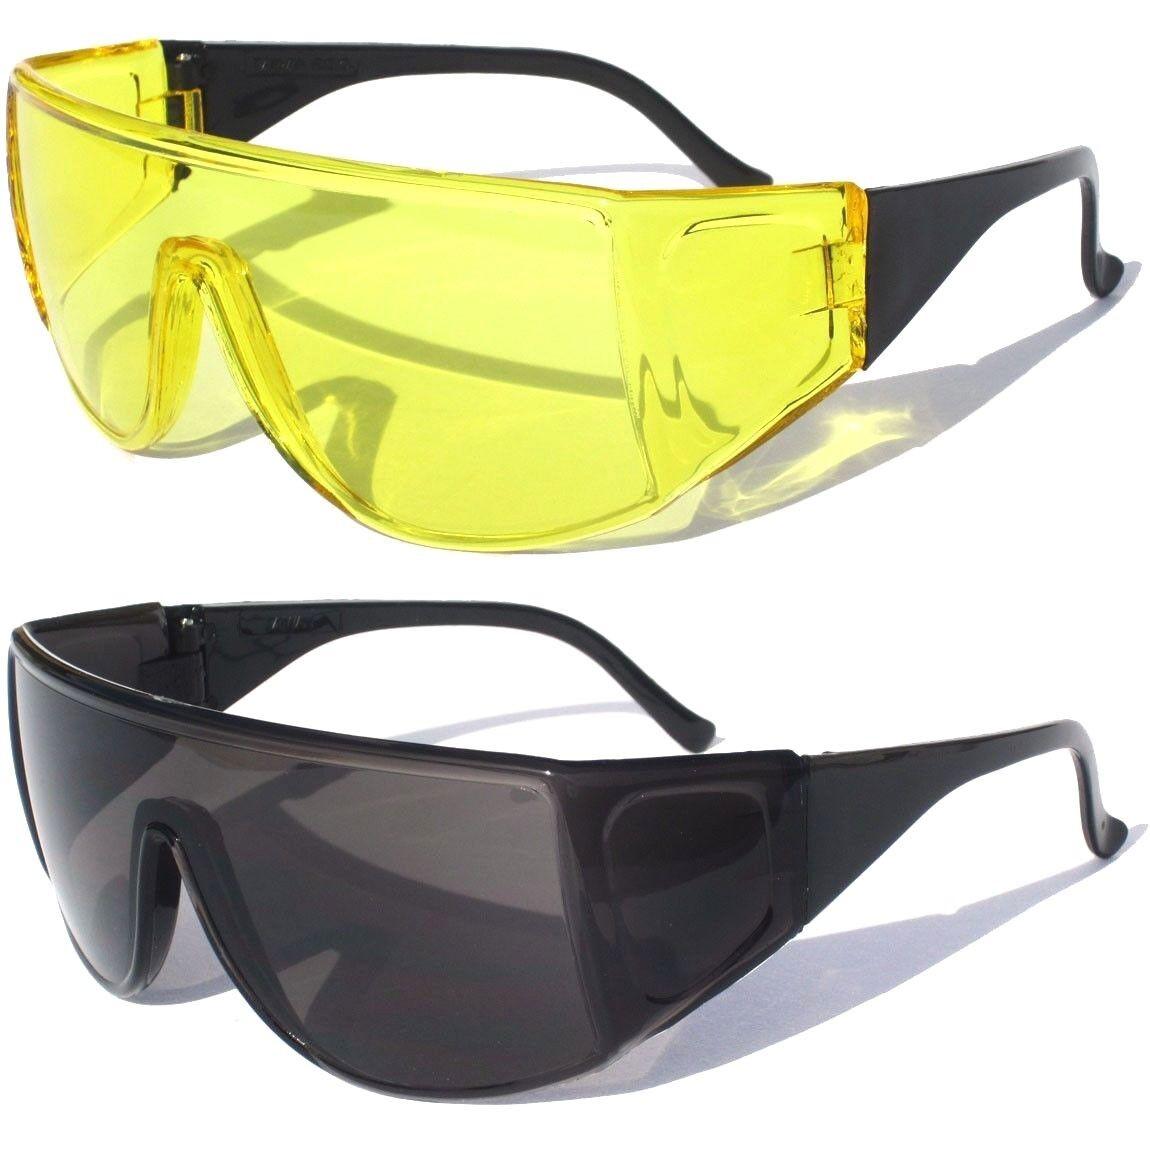 60e5e76bd6 Goggles Shooting Gun Range Eye Protection Safety Glasses Sunglasses ...